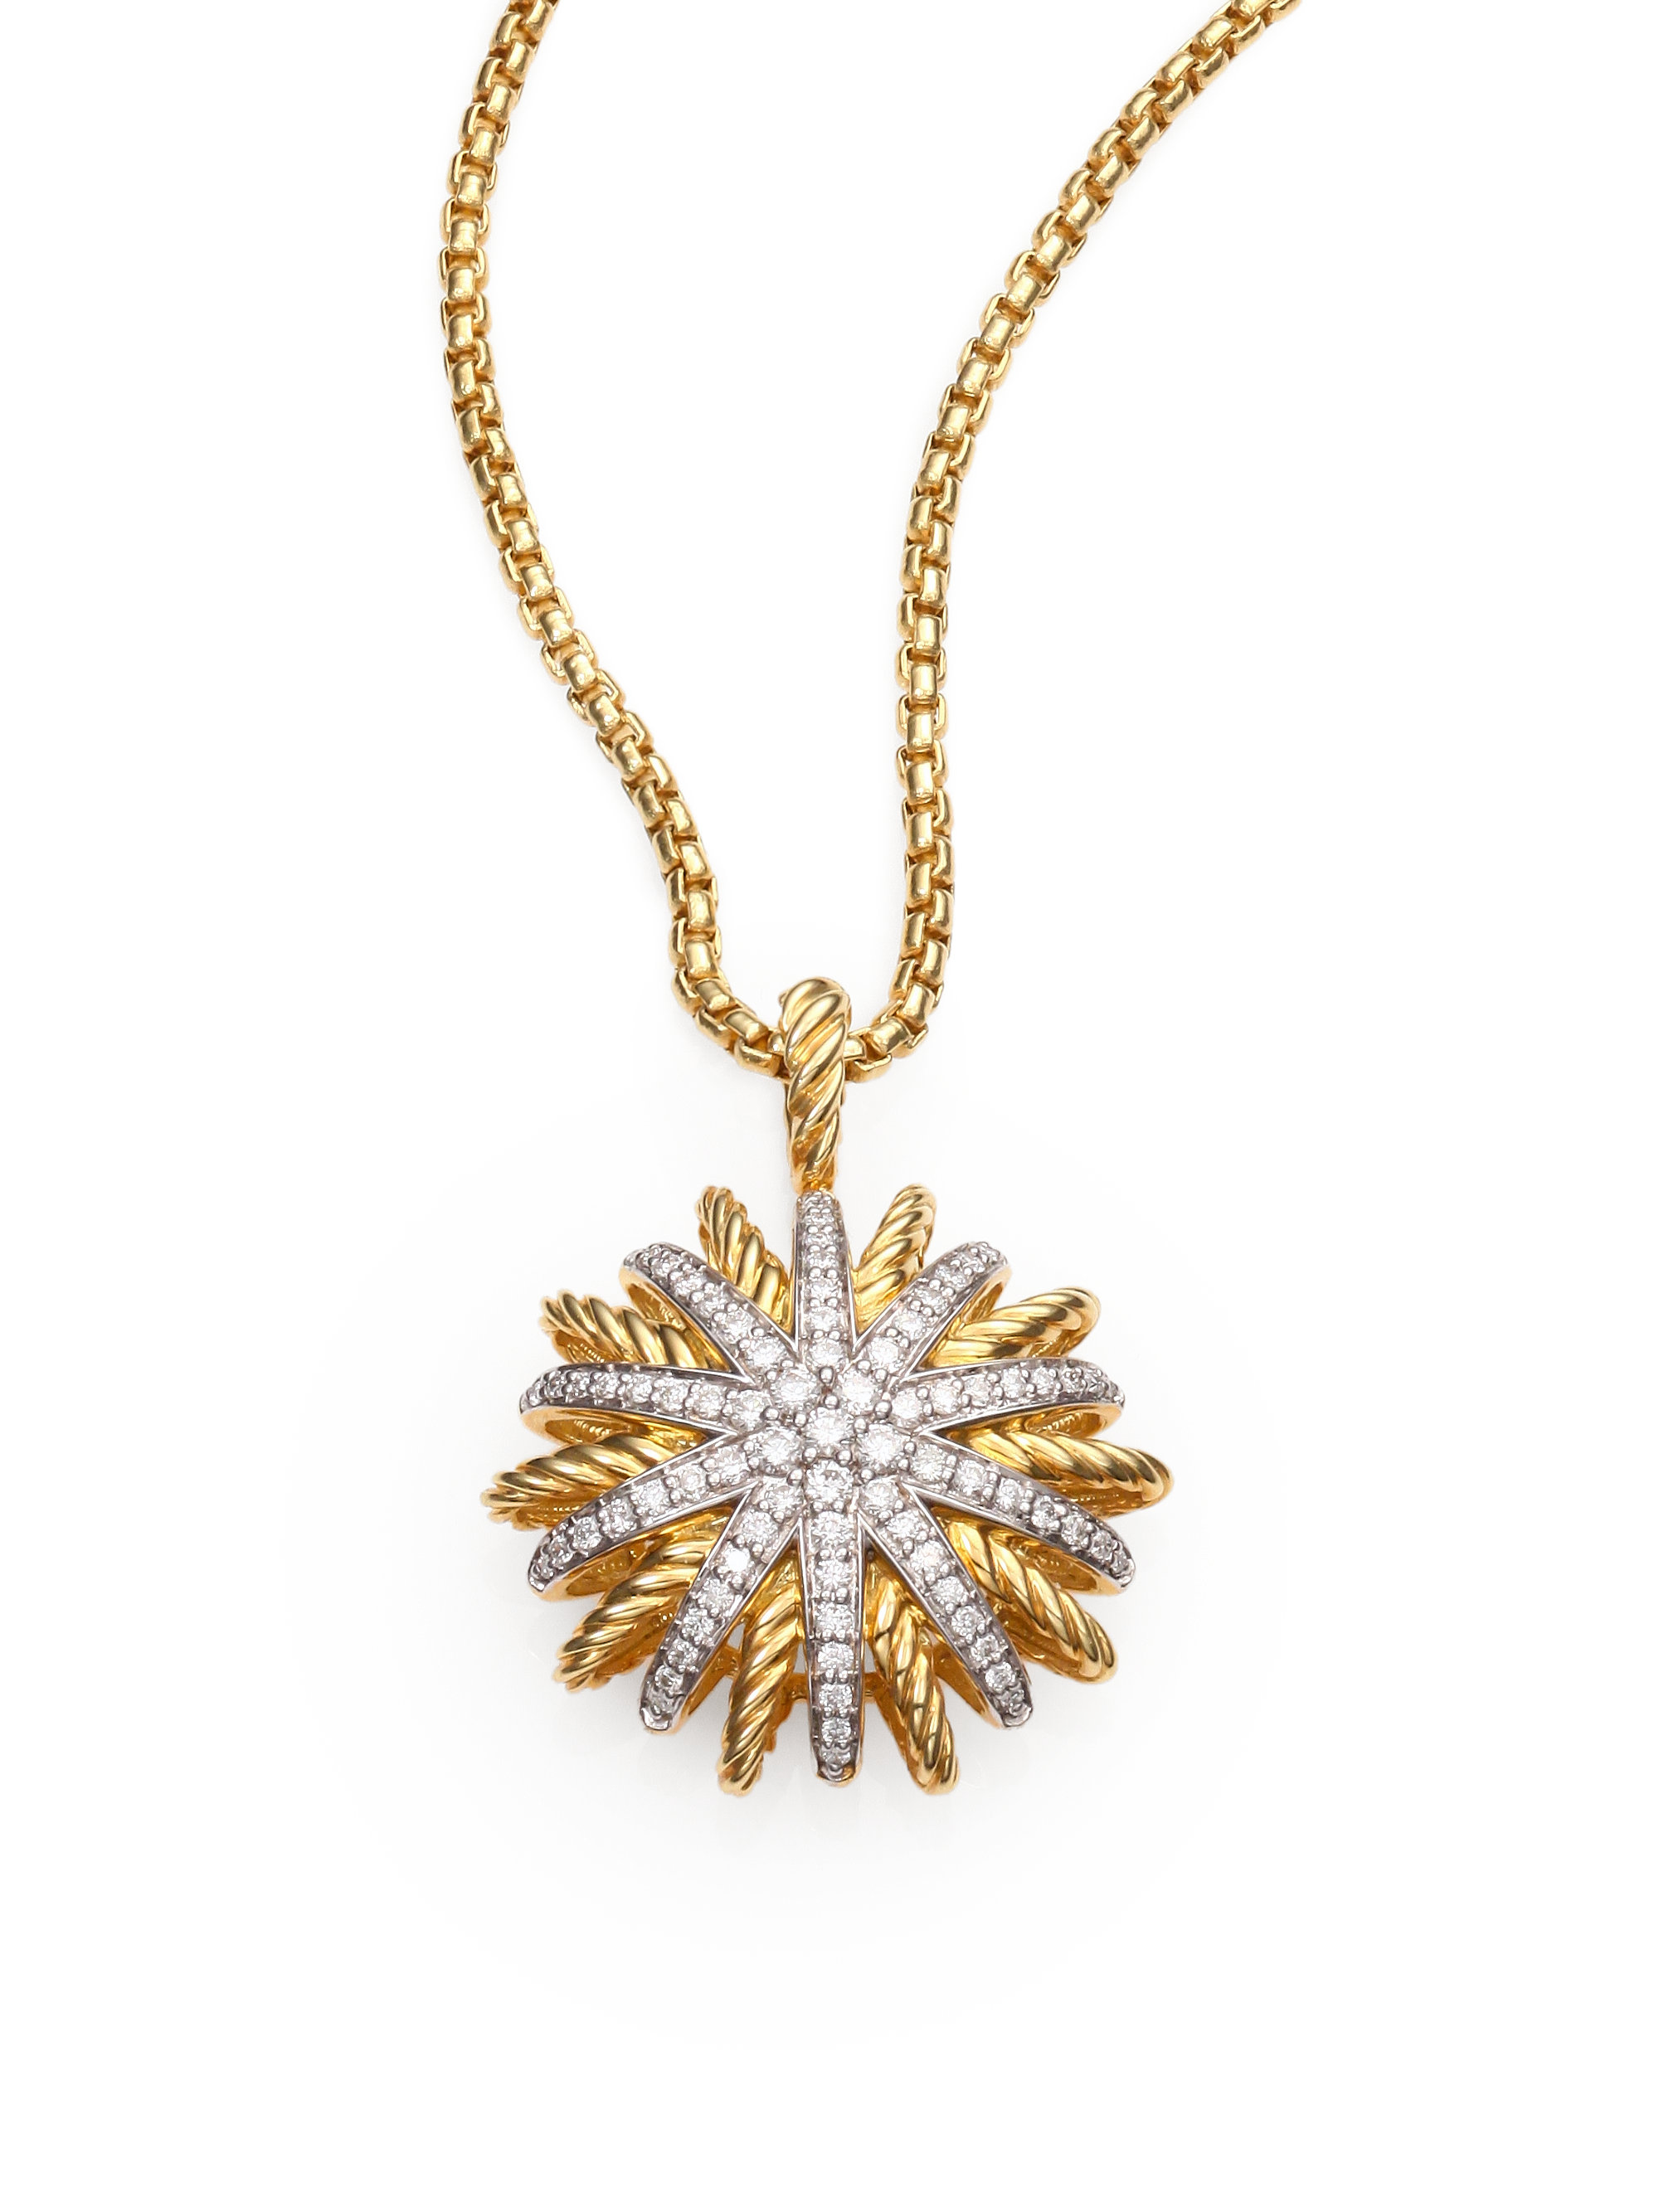 david yurman 18k gold starburst pendant necklace